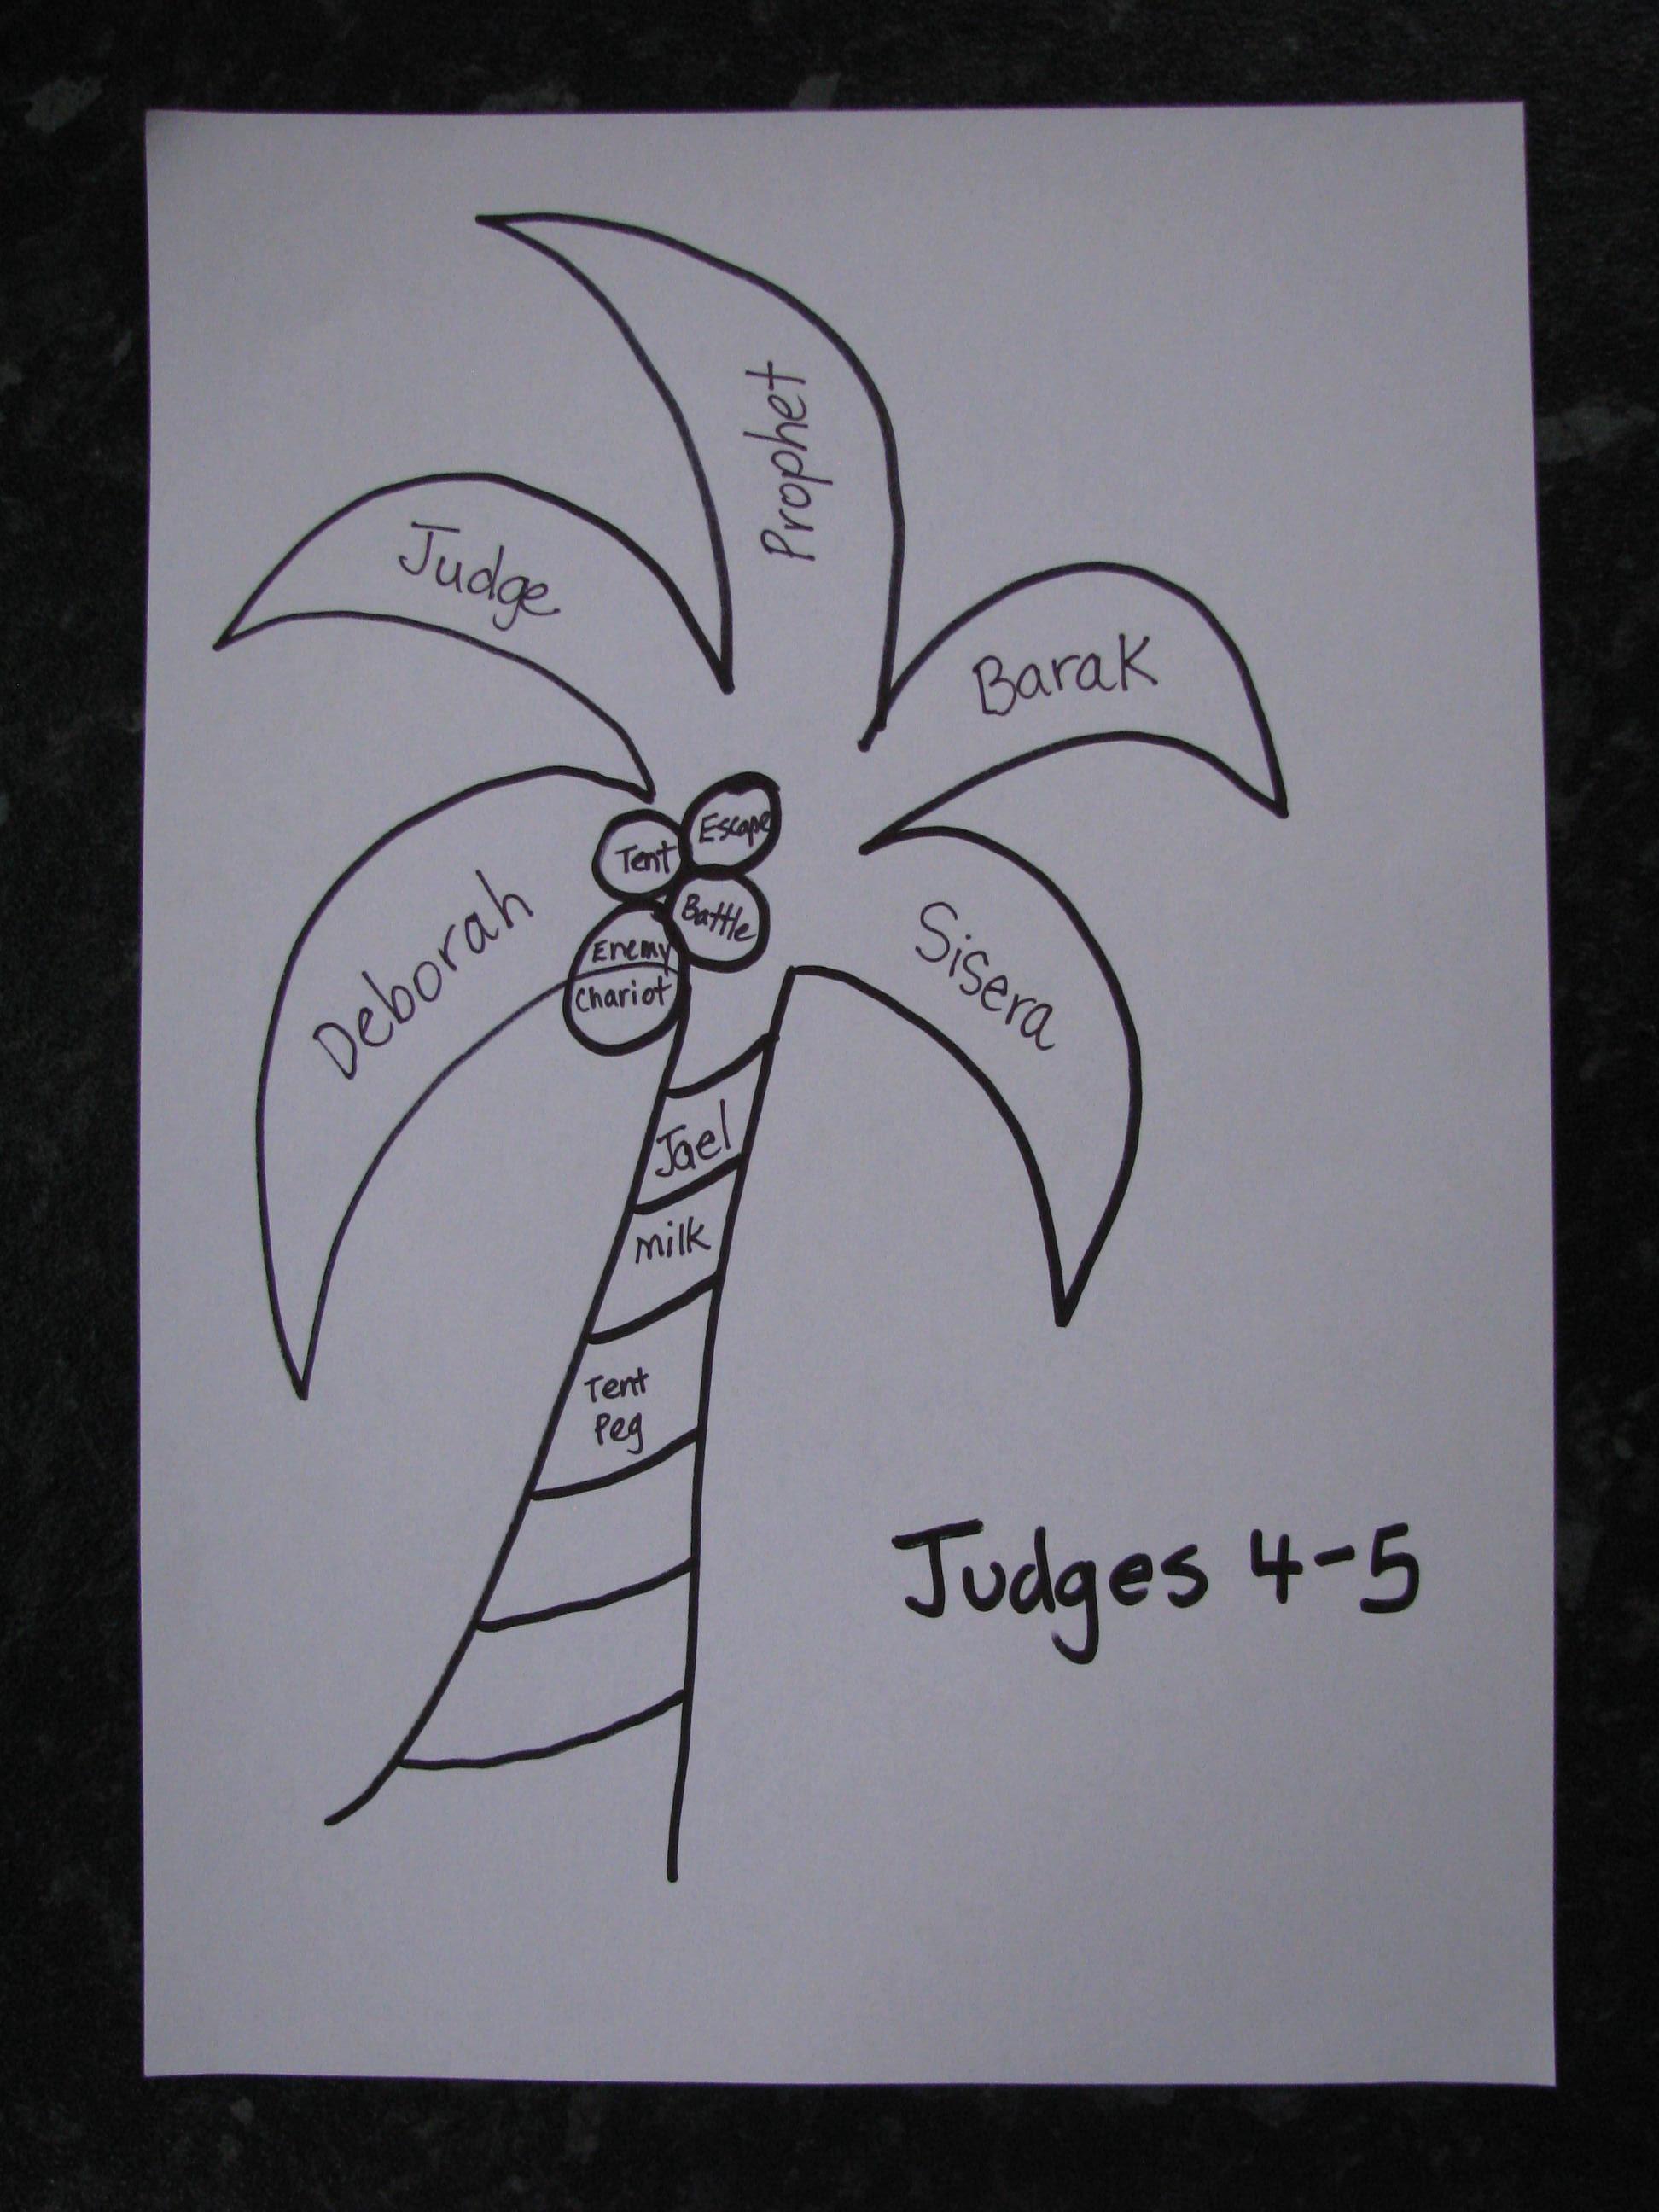 Deborah The Judge